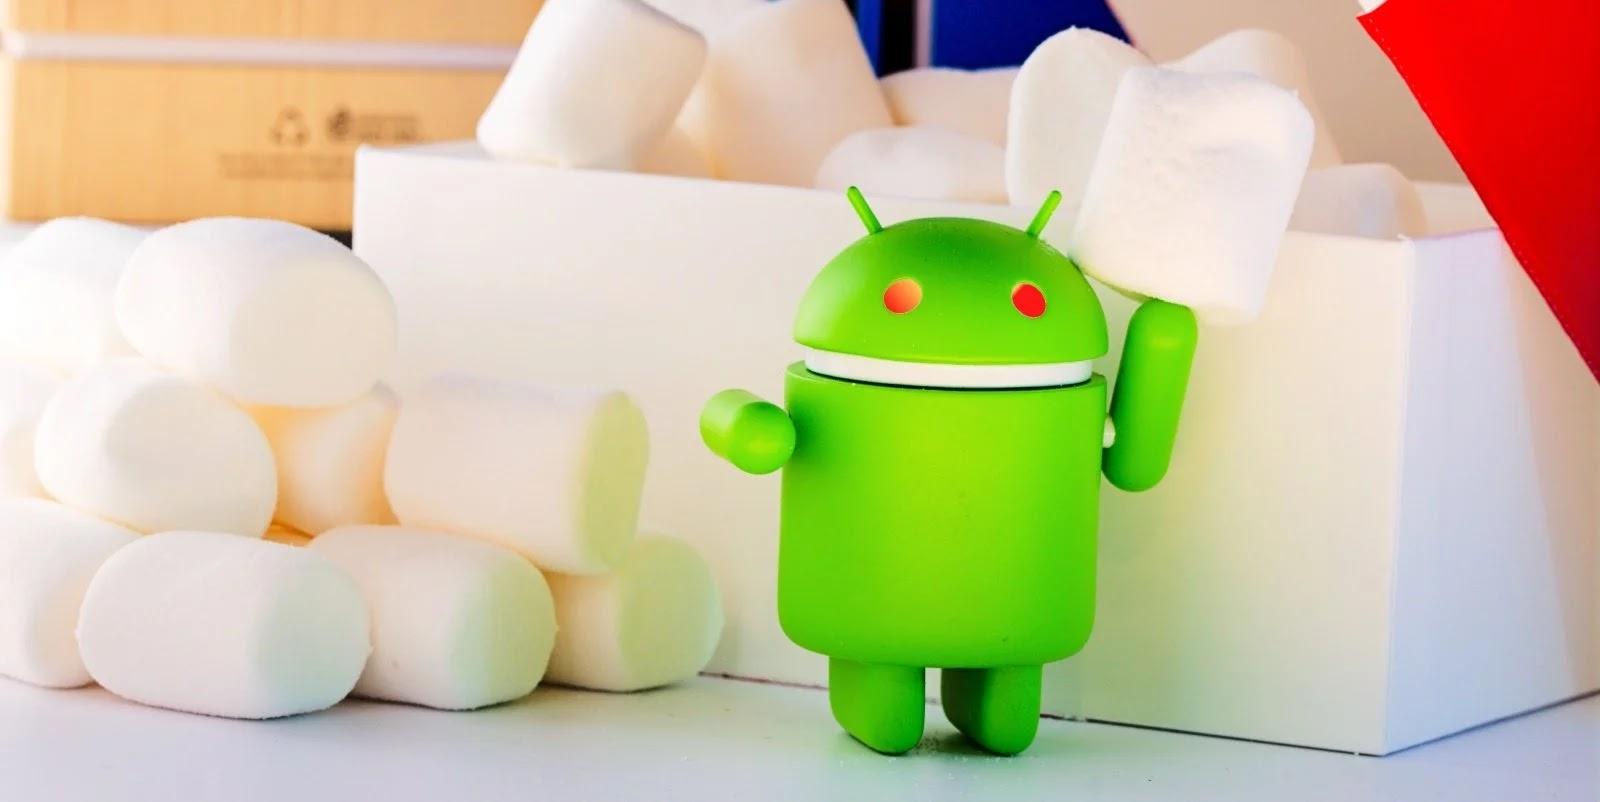 Máy chủ cập nhật Gigaset Android